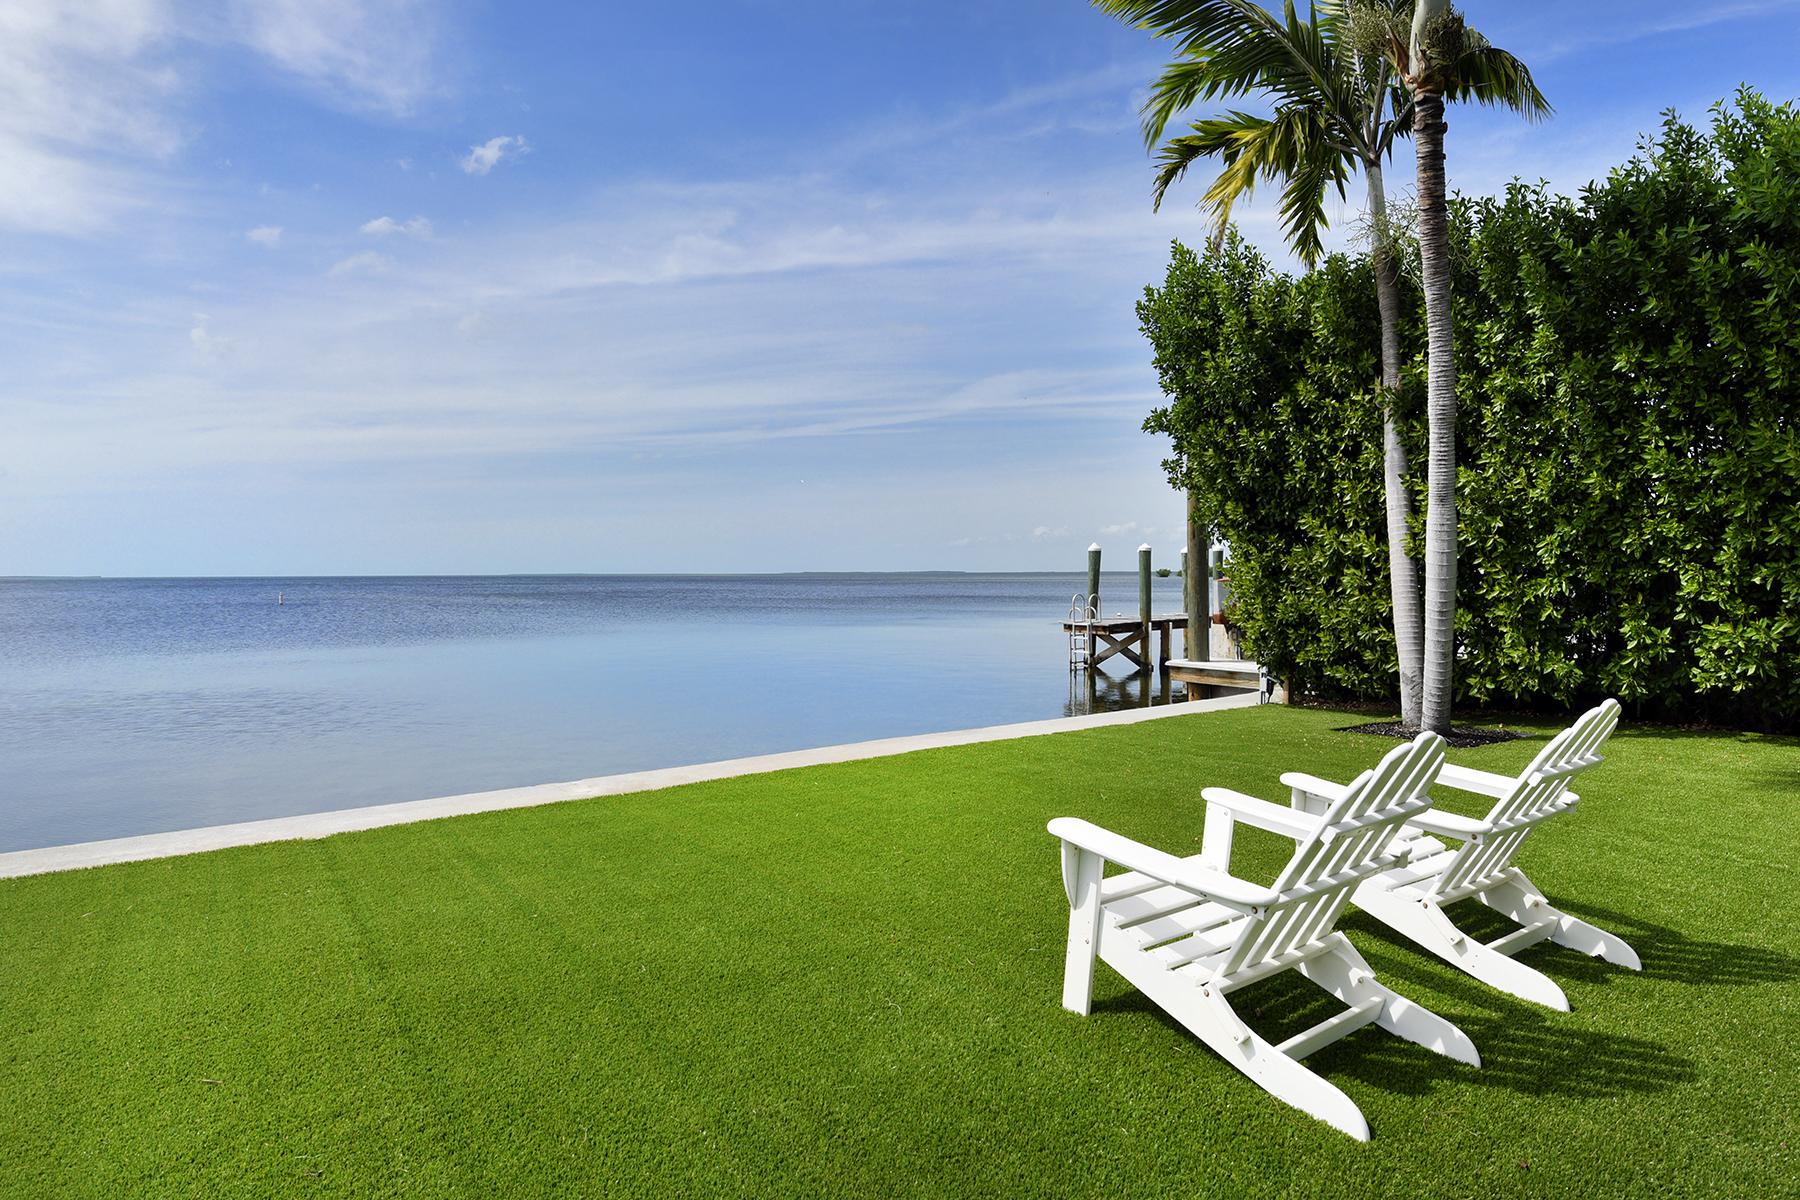 Additional photo for property listing at Casa Del Sol 169 Indian Mound Trail Islamorada, Florida 33070 Hoa Kỳ